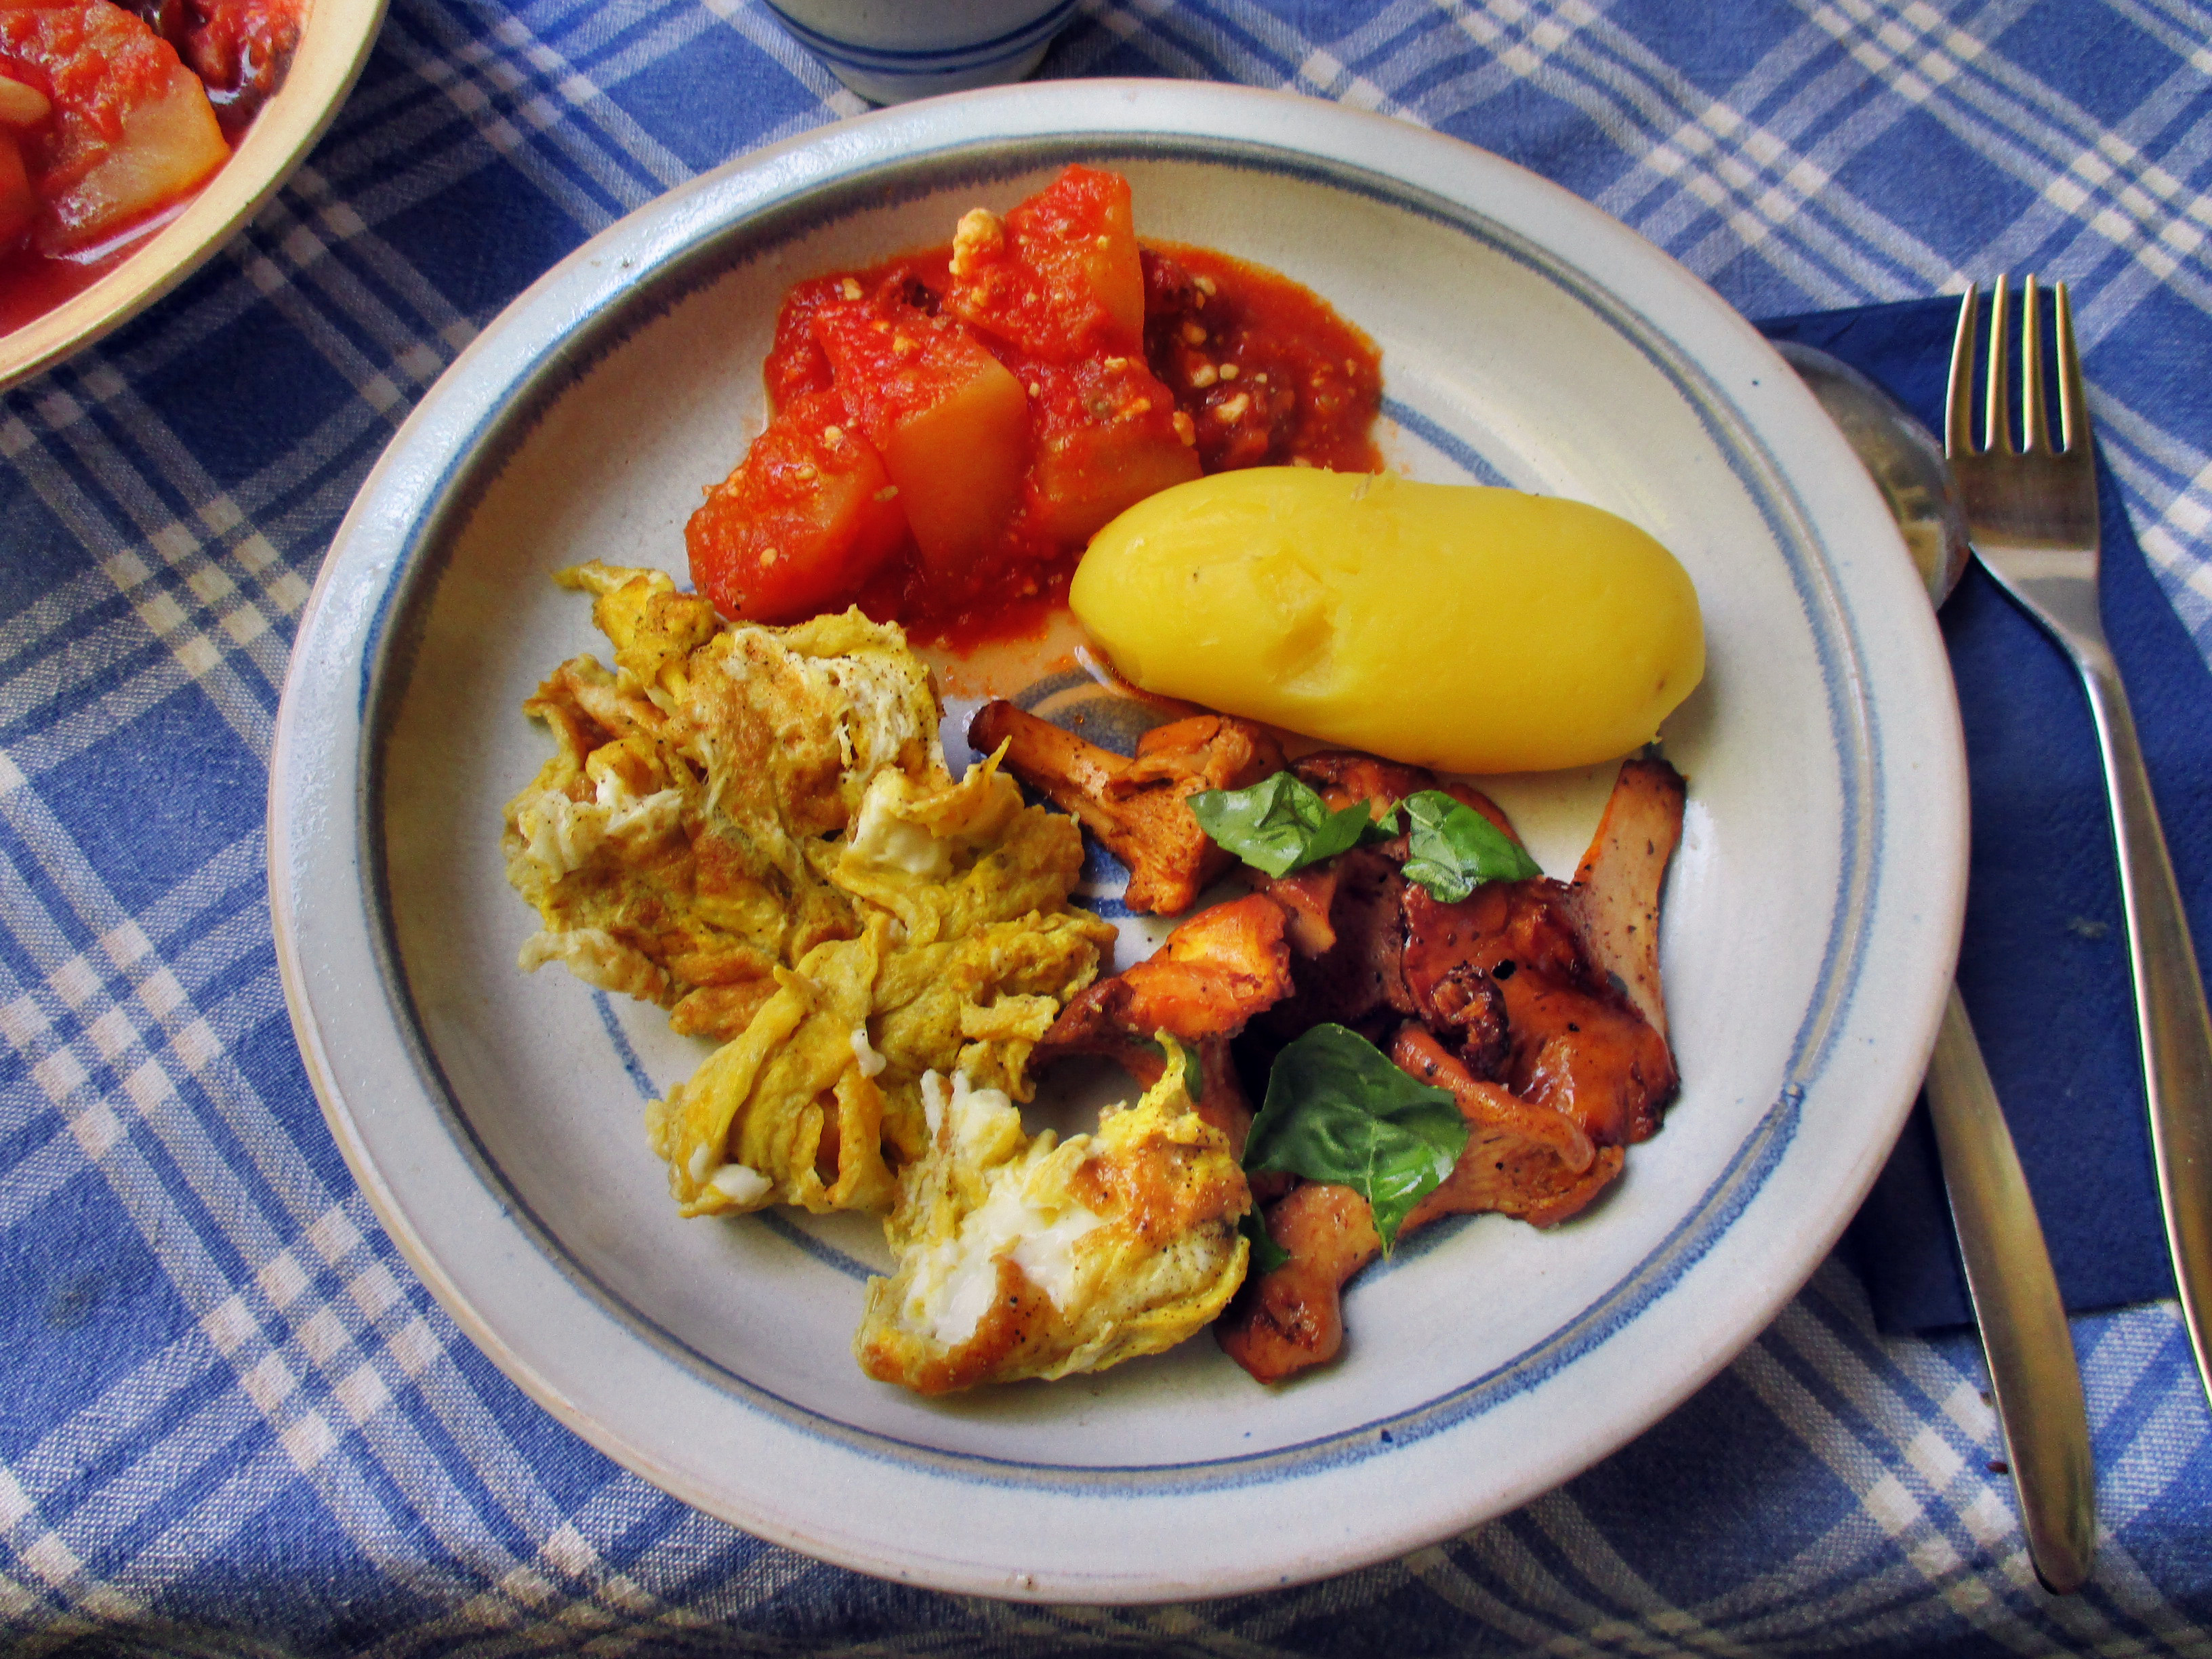 Pfifferlinge,Kartoffeln,Salat -2.7.15   (6)